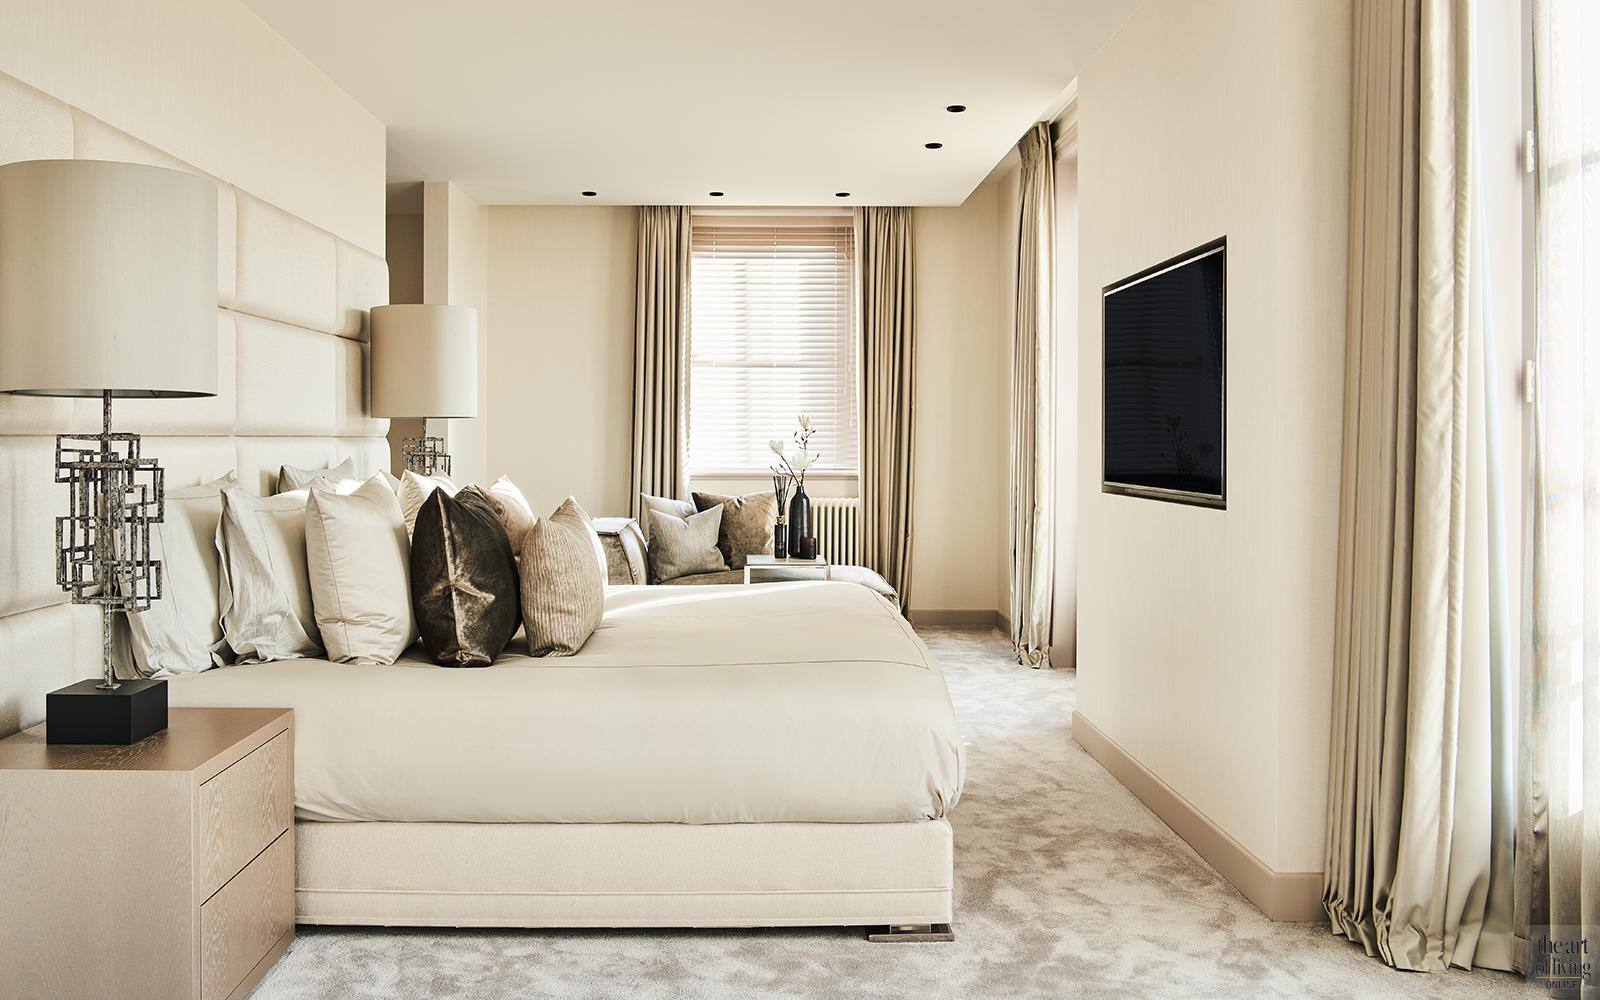 Exclusief interieur, Eric Kuster, Culimaat, Metropolitan Luxury, Master bedroom, hotel suite, Interieur, Luxueus interieur, Slaapkamer